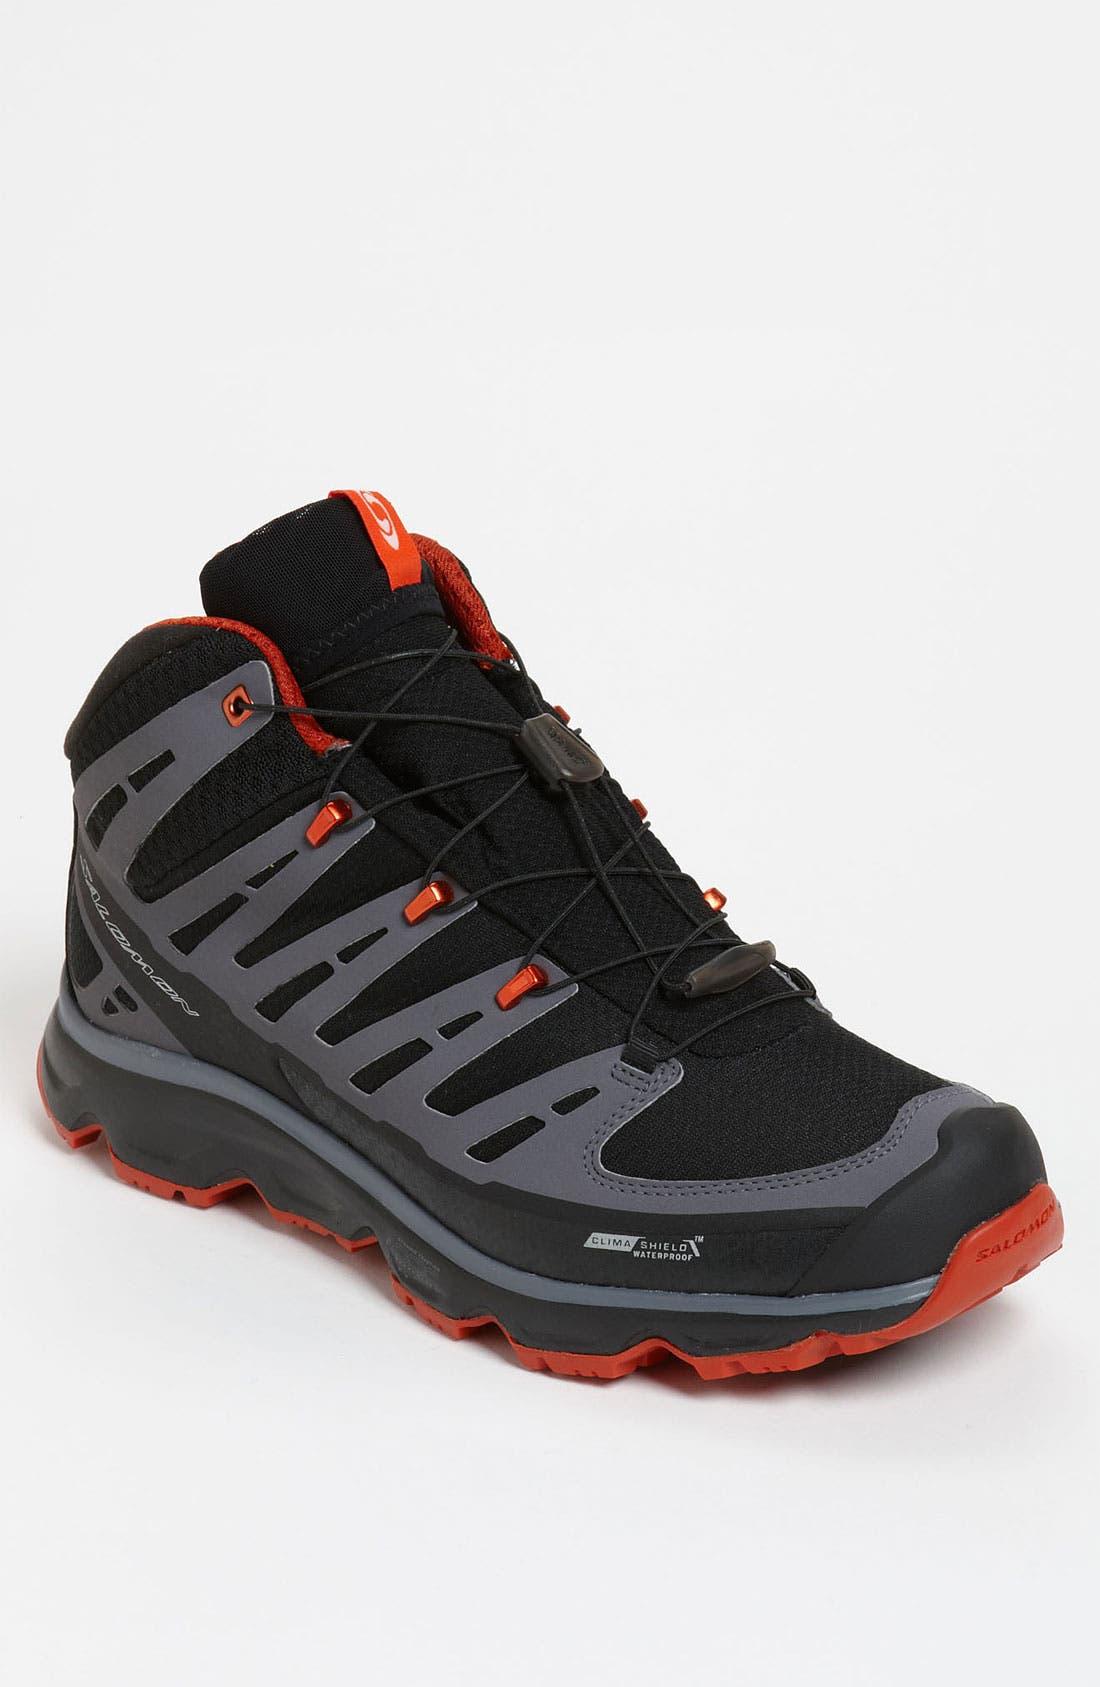 Alternate Image 1 Selected - Salomon 'Synapse Mid CS' Hiking Shoe (Men) (Online Only)